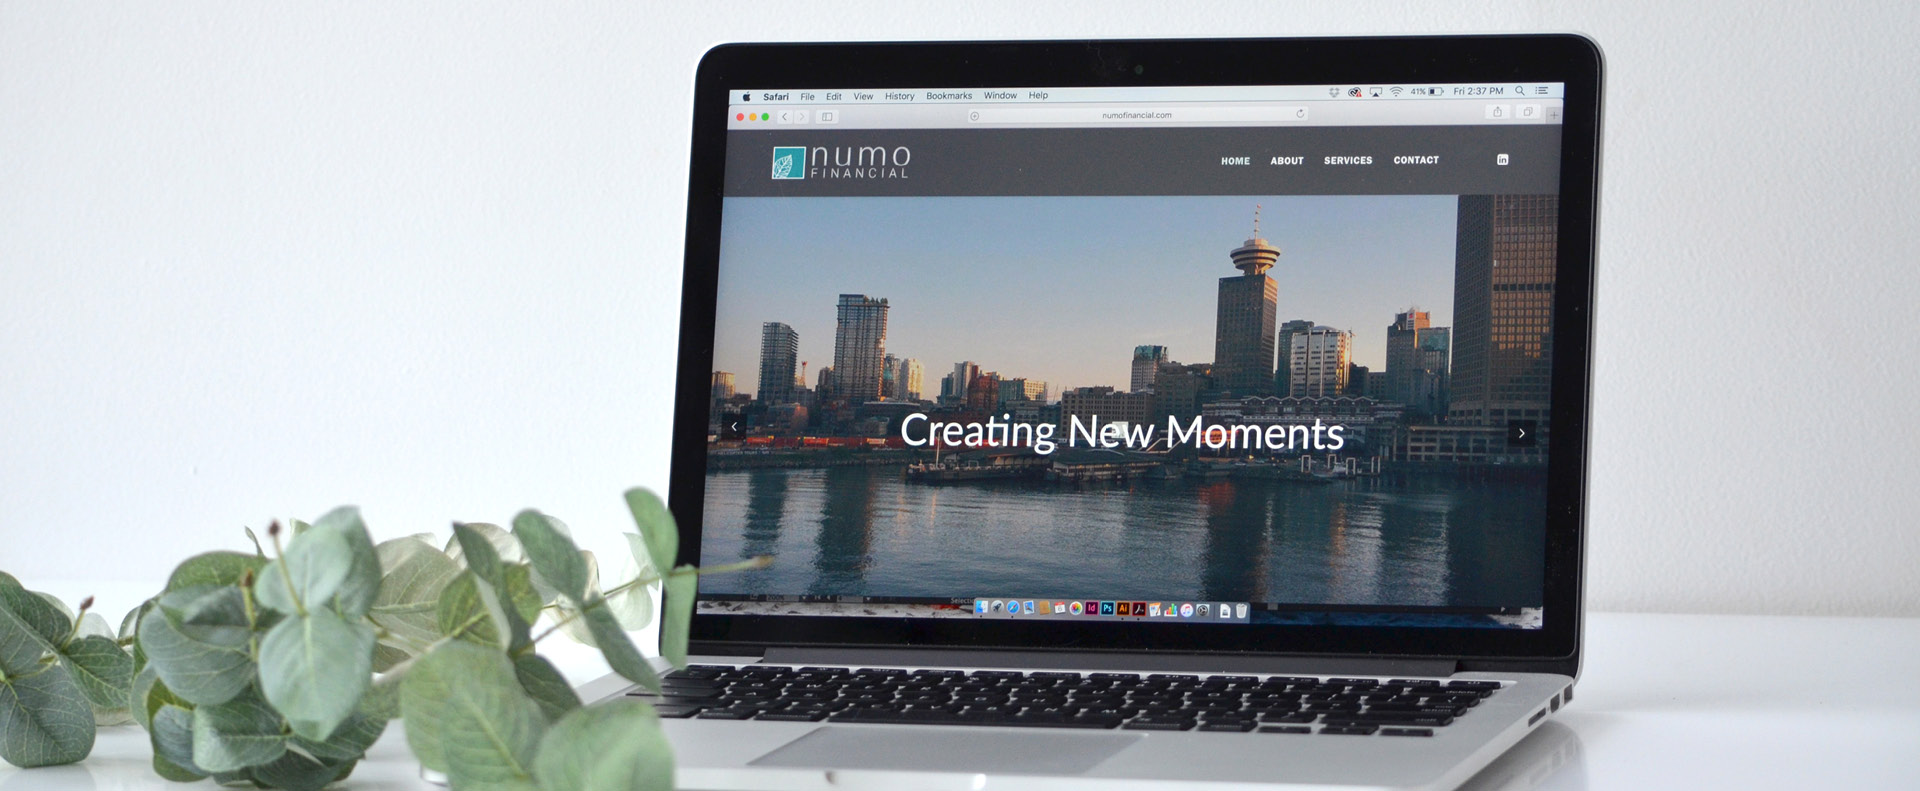 numo financial website shown on a laptop - White Canvas Design